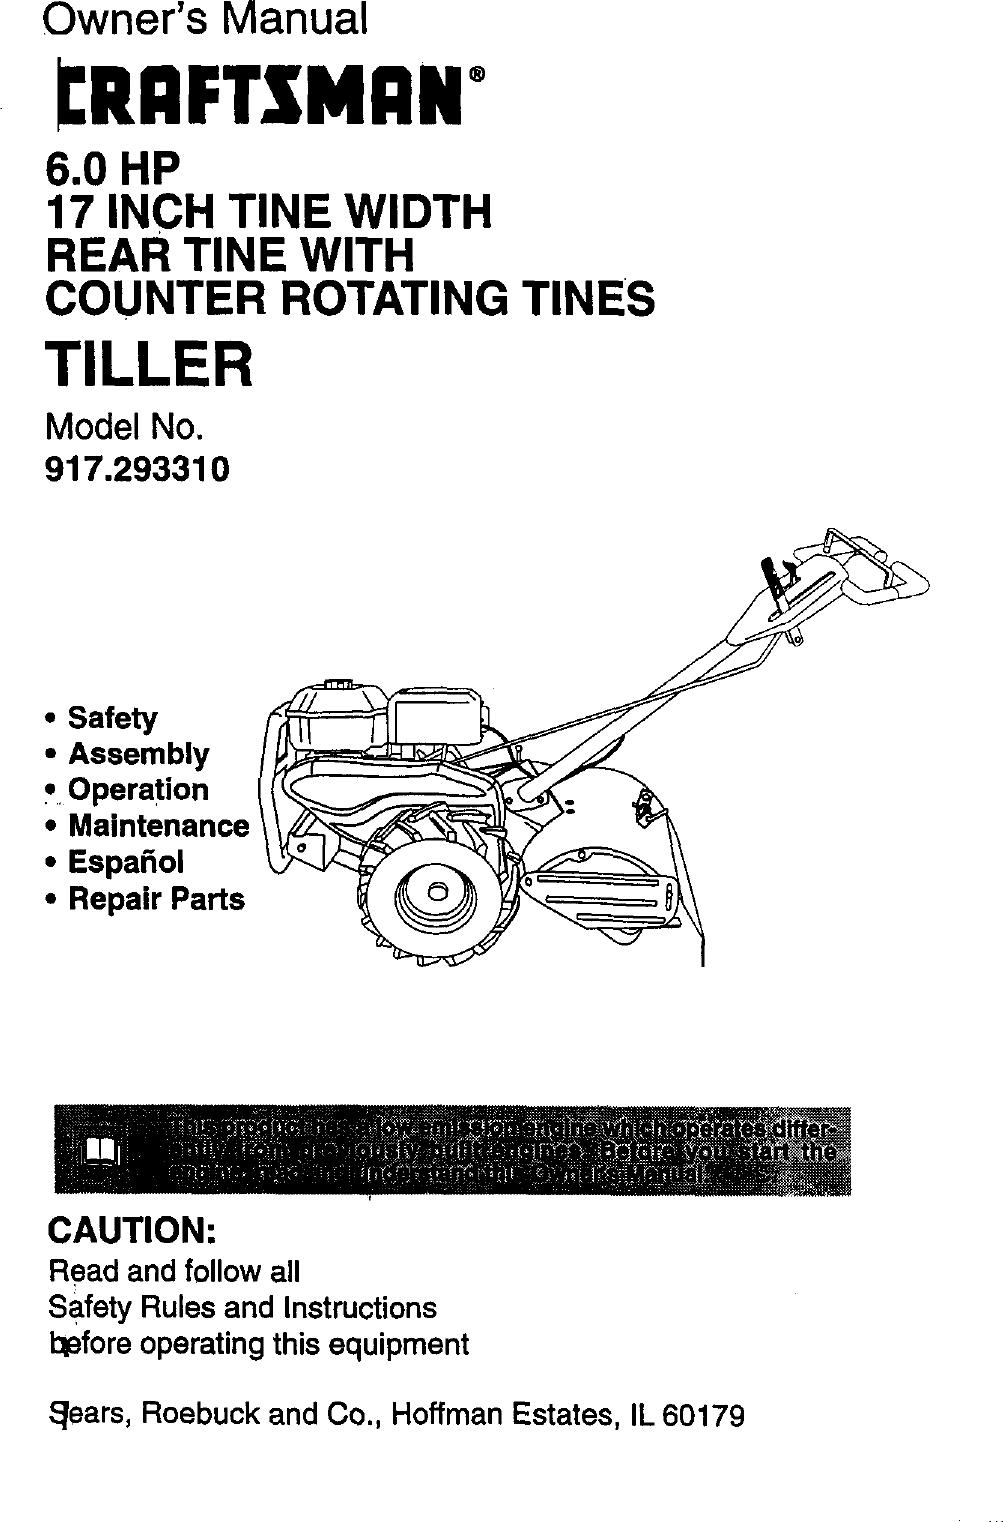 Craftsman 917 29331 Owners Manual ManualsLib Makes It Easy